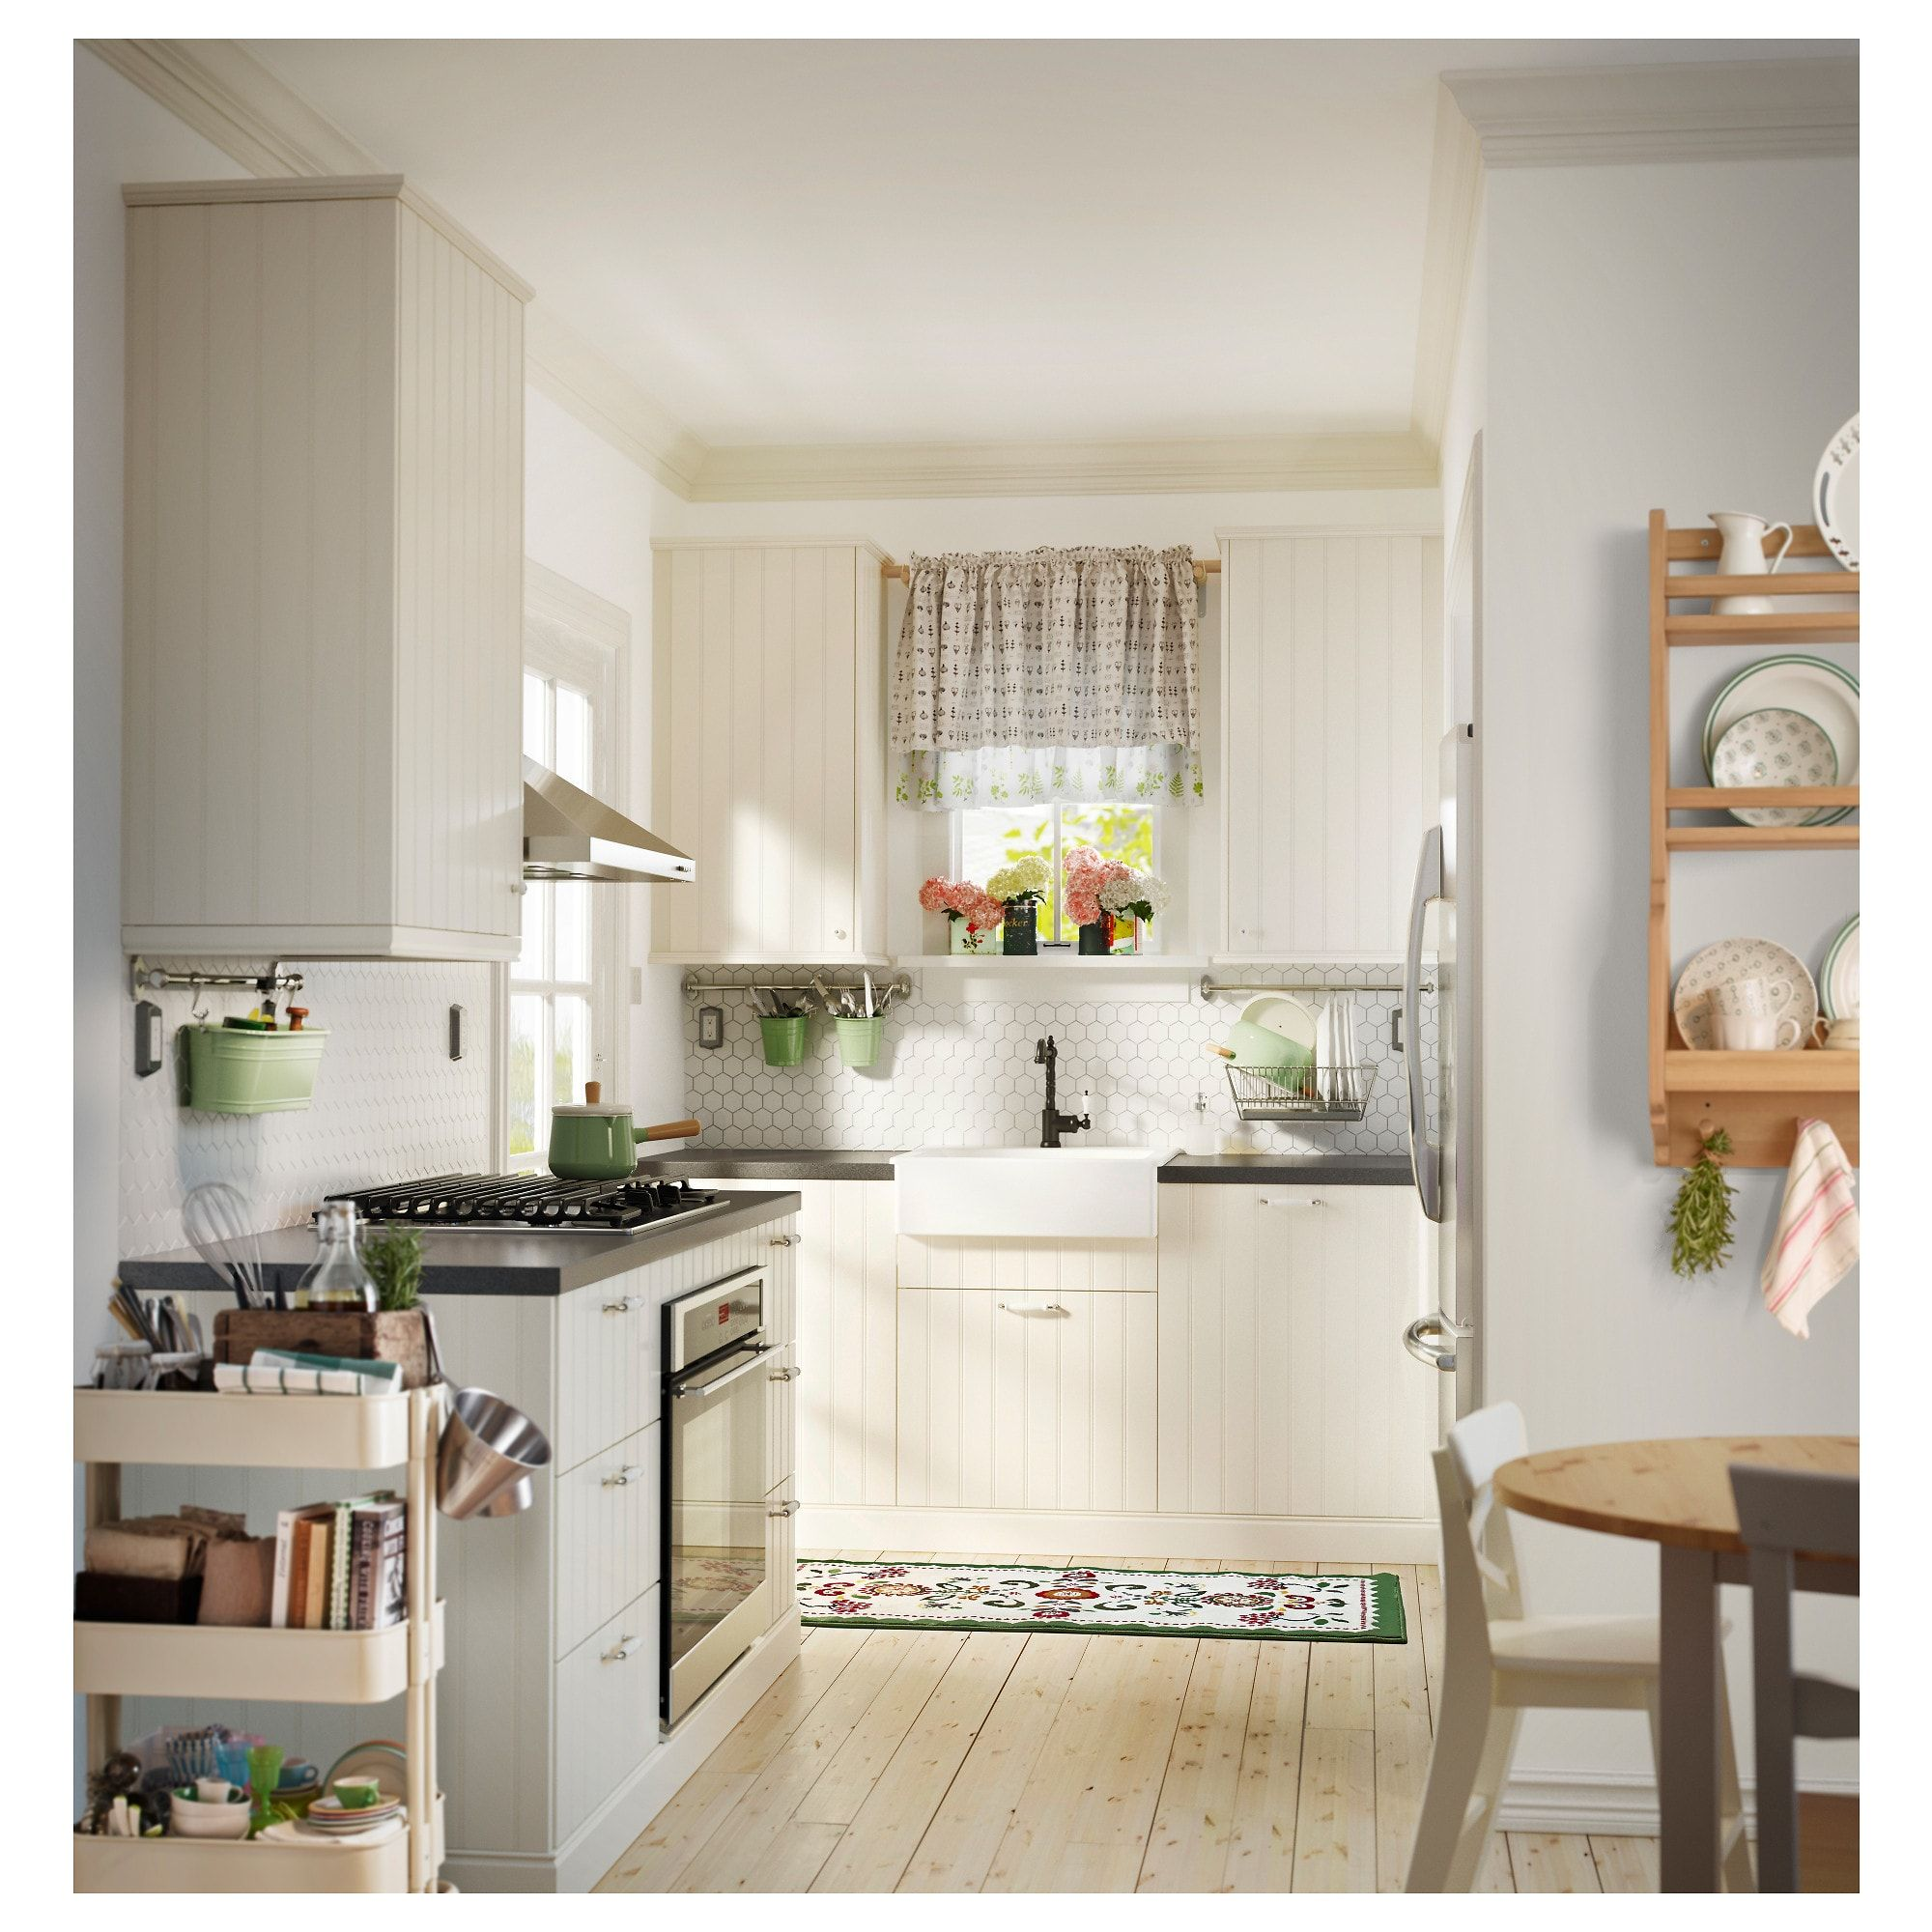 Hittarp Door Off White 24x40 Ikea Affordable Farmhouse Kitchen Kitchen Trends Kitchen Interior